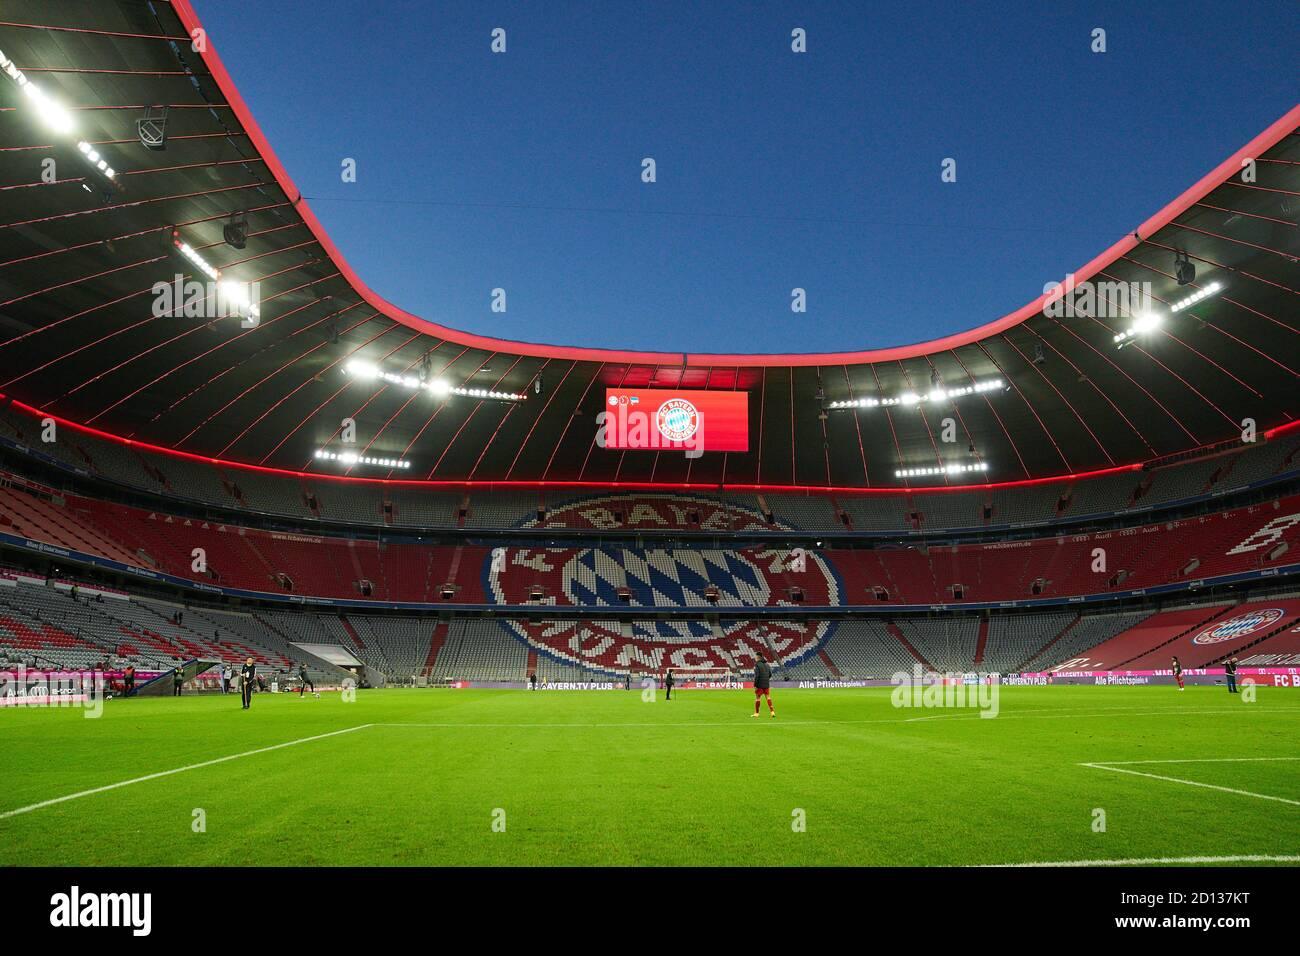 Football Munich - Hertha, Munich Oct 04, 2020. Allianz Arena inside, Beleuchtung  FC BAYERN MUENCHEN - HERTHA BSC BERLIN 4-3 1.German Soccer League , Munich, October 04, 2020.  Season 2020/2021, match day 03, FCB, München, Munich © Peter Schatz / Alamy Live News    - DFL REGULATIONS PROHIBIT ANY USE OF PHOTOGRAPHS as IMAGE SEQUENCES and/or QUASI-VIDEO - Stock Photo